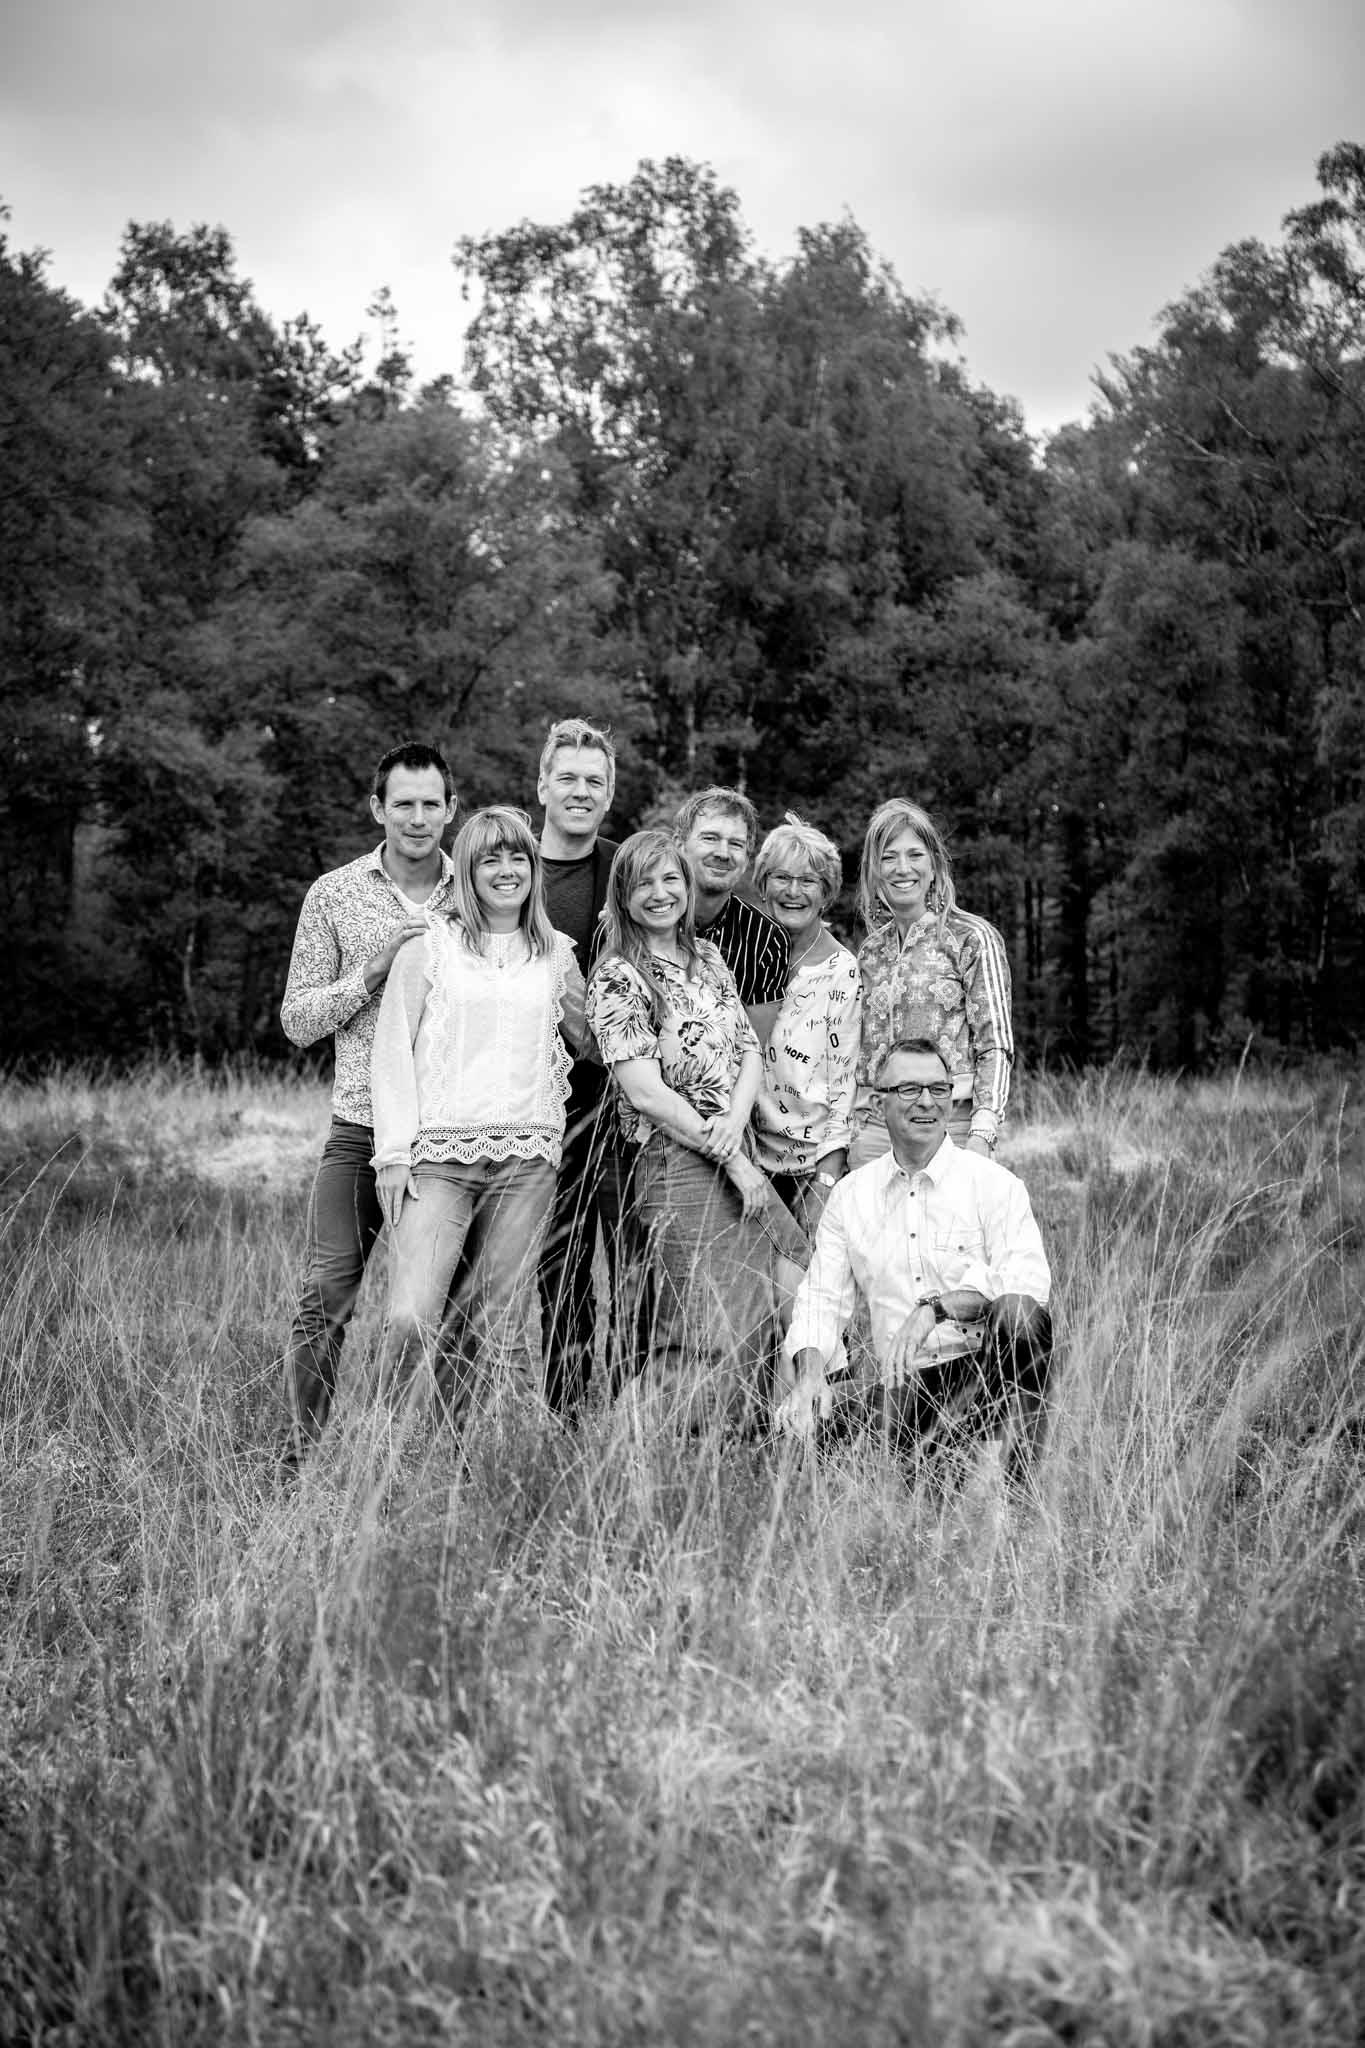 Familieshoot, spontane foto's, Waschkolk, Nunspeet